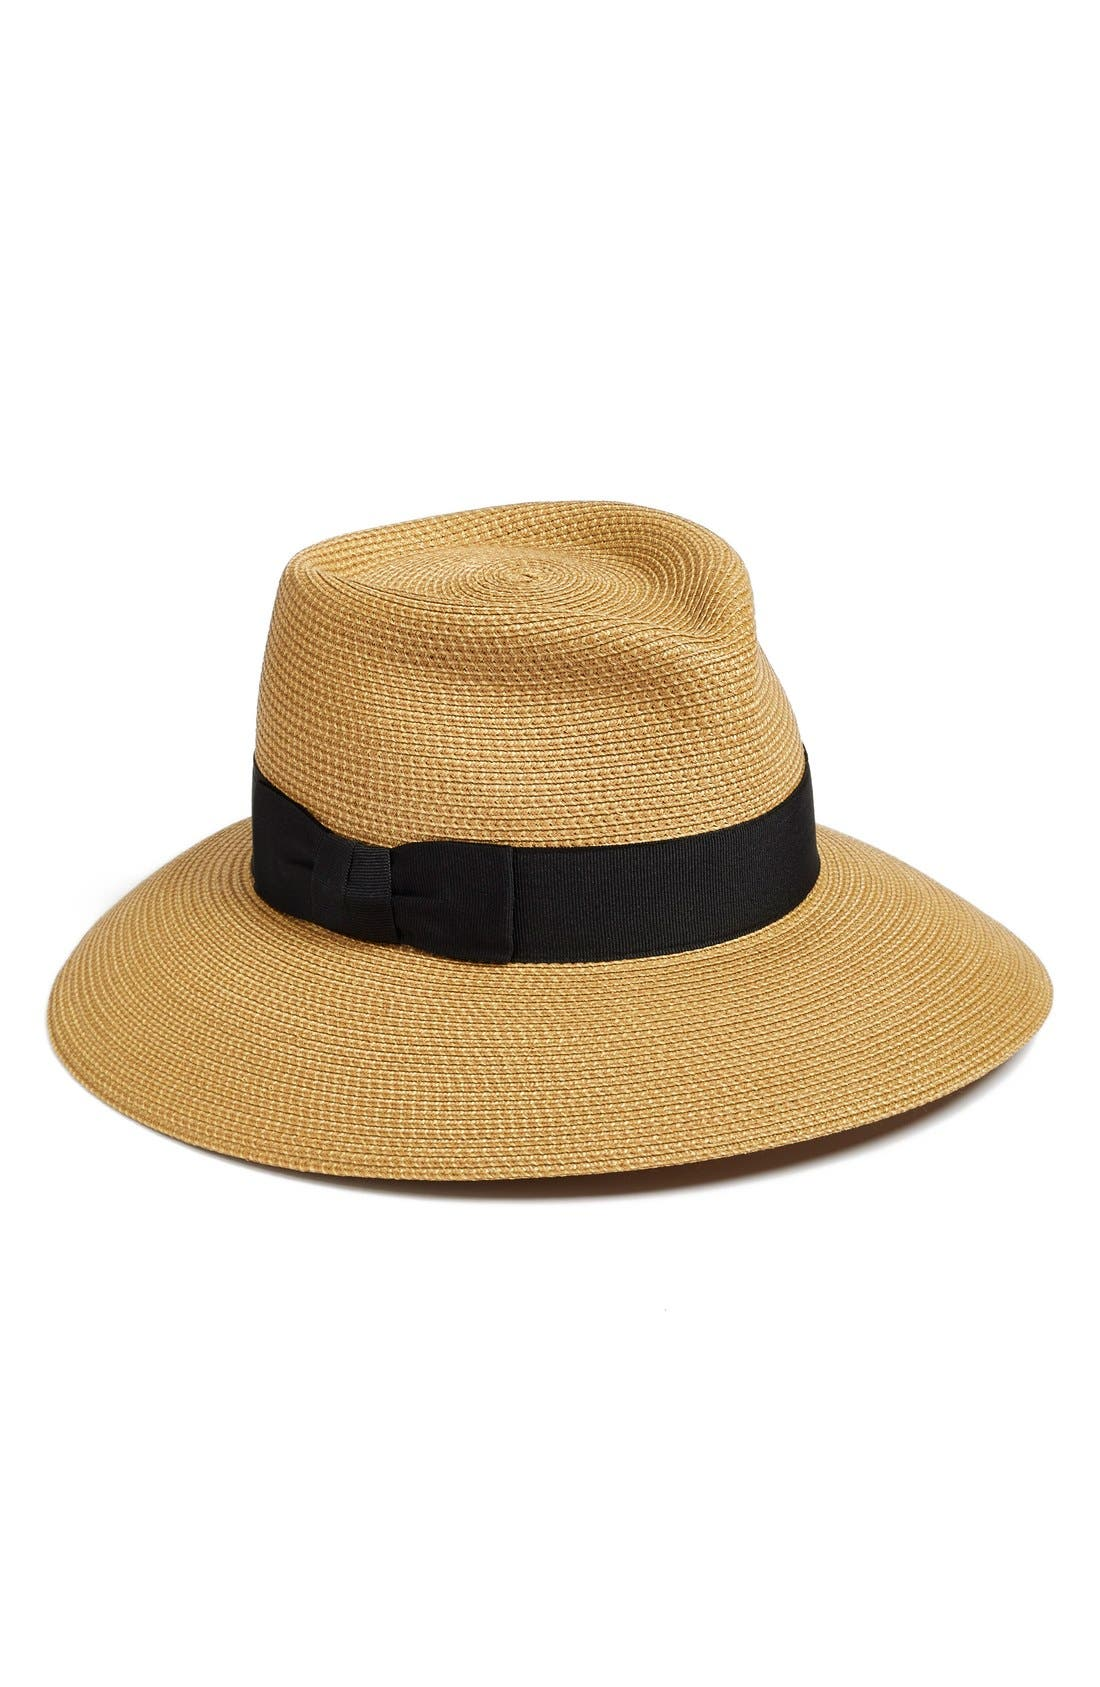 Alternate Image 1 Selected - Eric Javits 'Phoenix' Packable Fedora Sun Hat